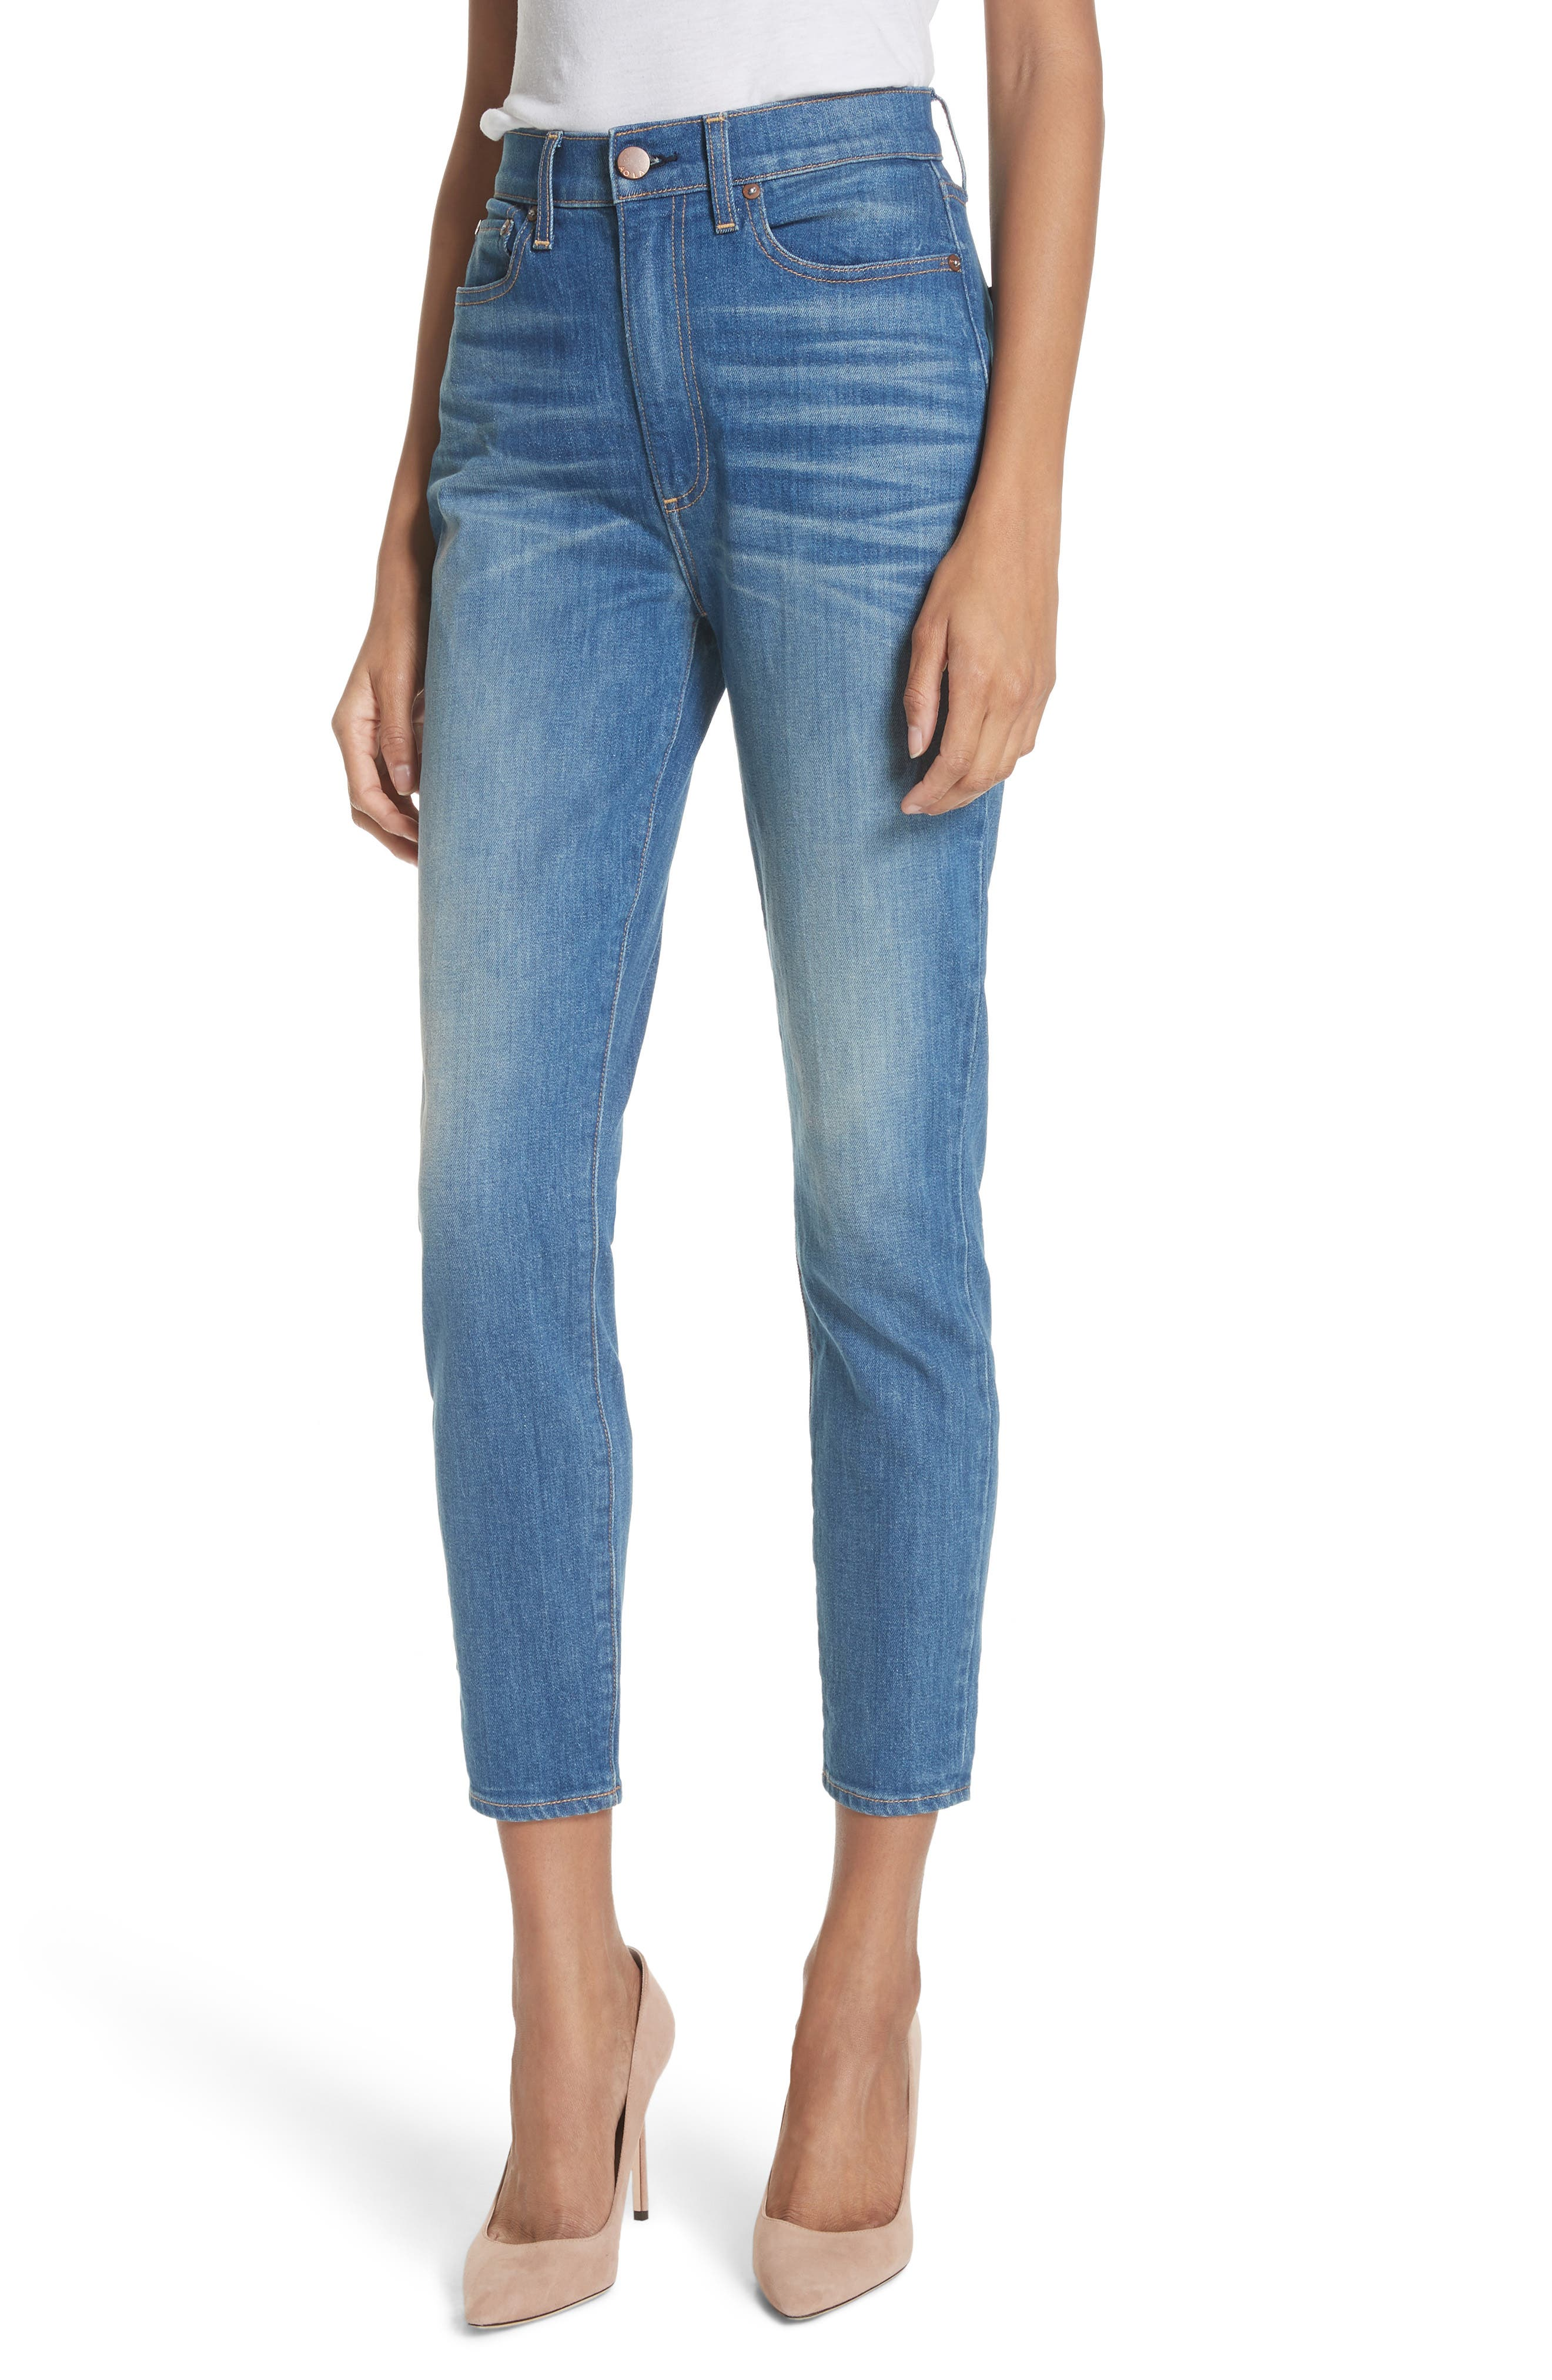 AO.LA Good High Waist Ankle Skinny Jeans,                             Main thumbnail 1, color,